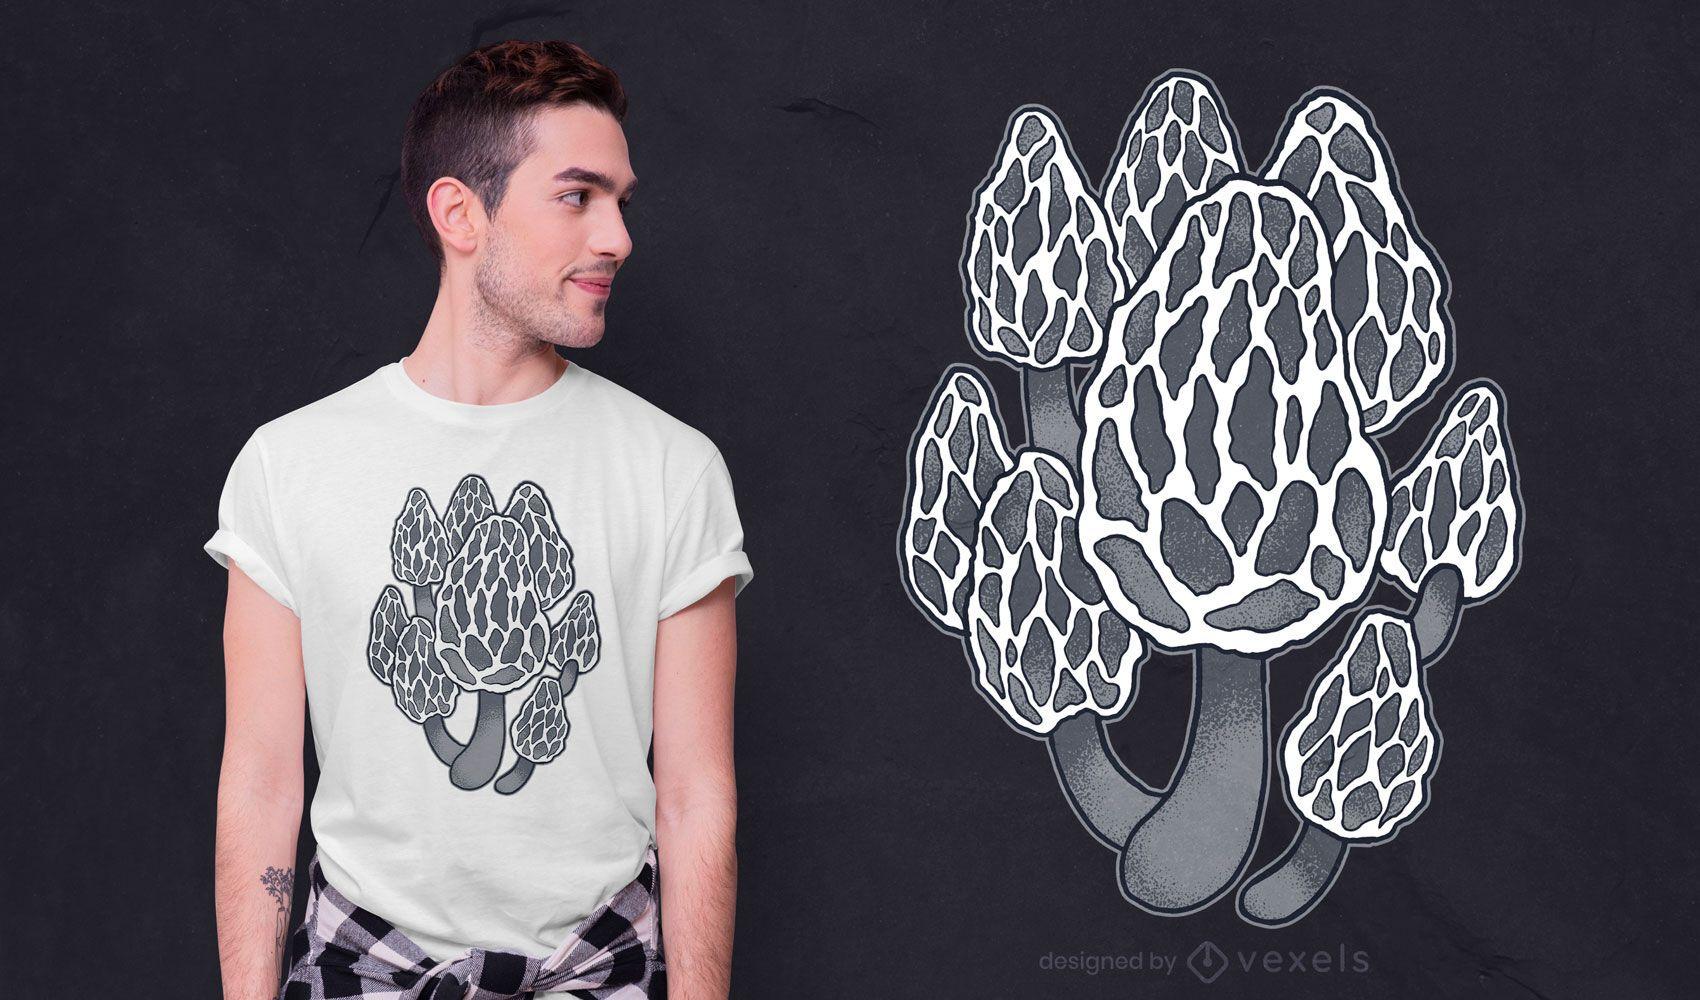 Design de t-shirt de cogumelos morel pretos